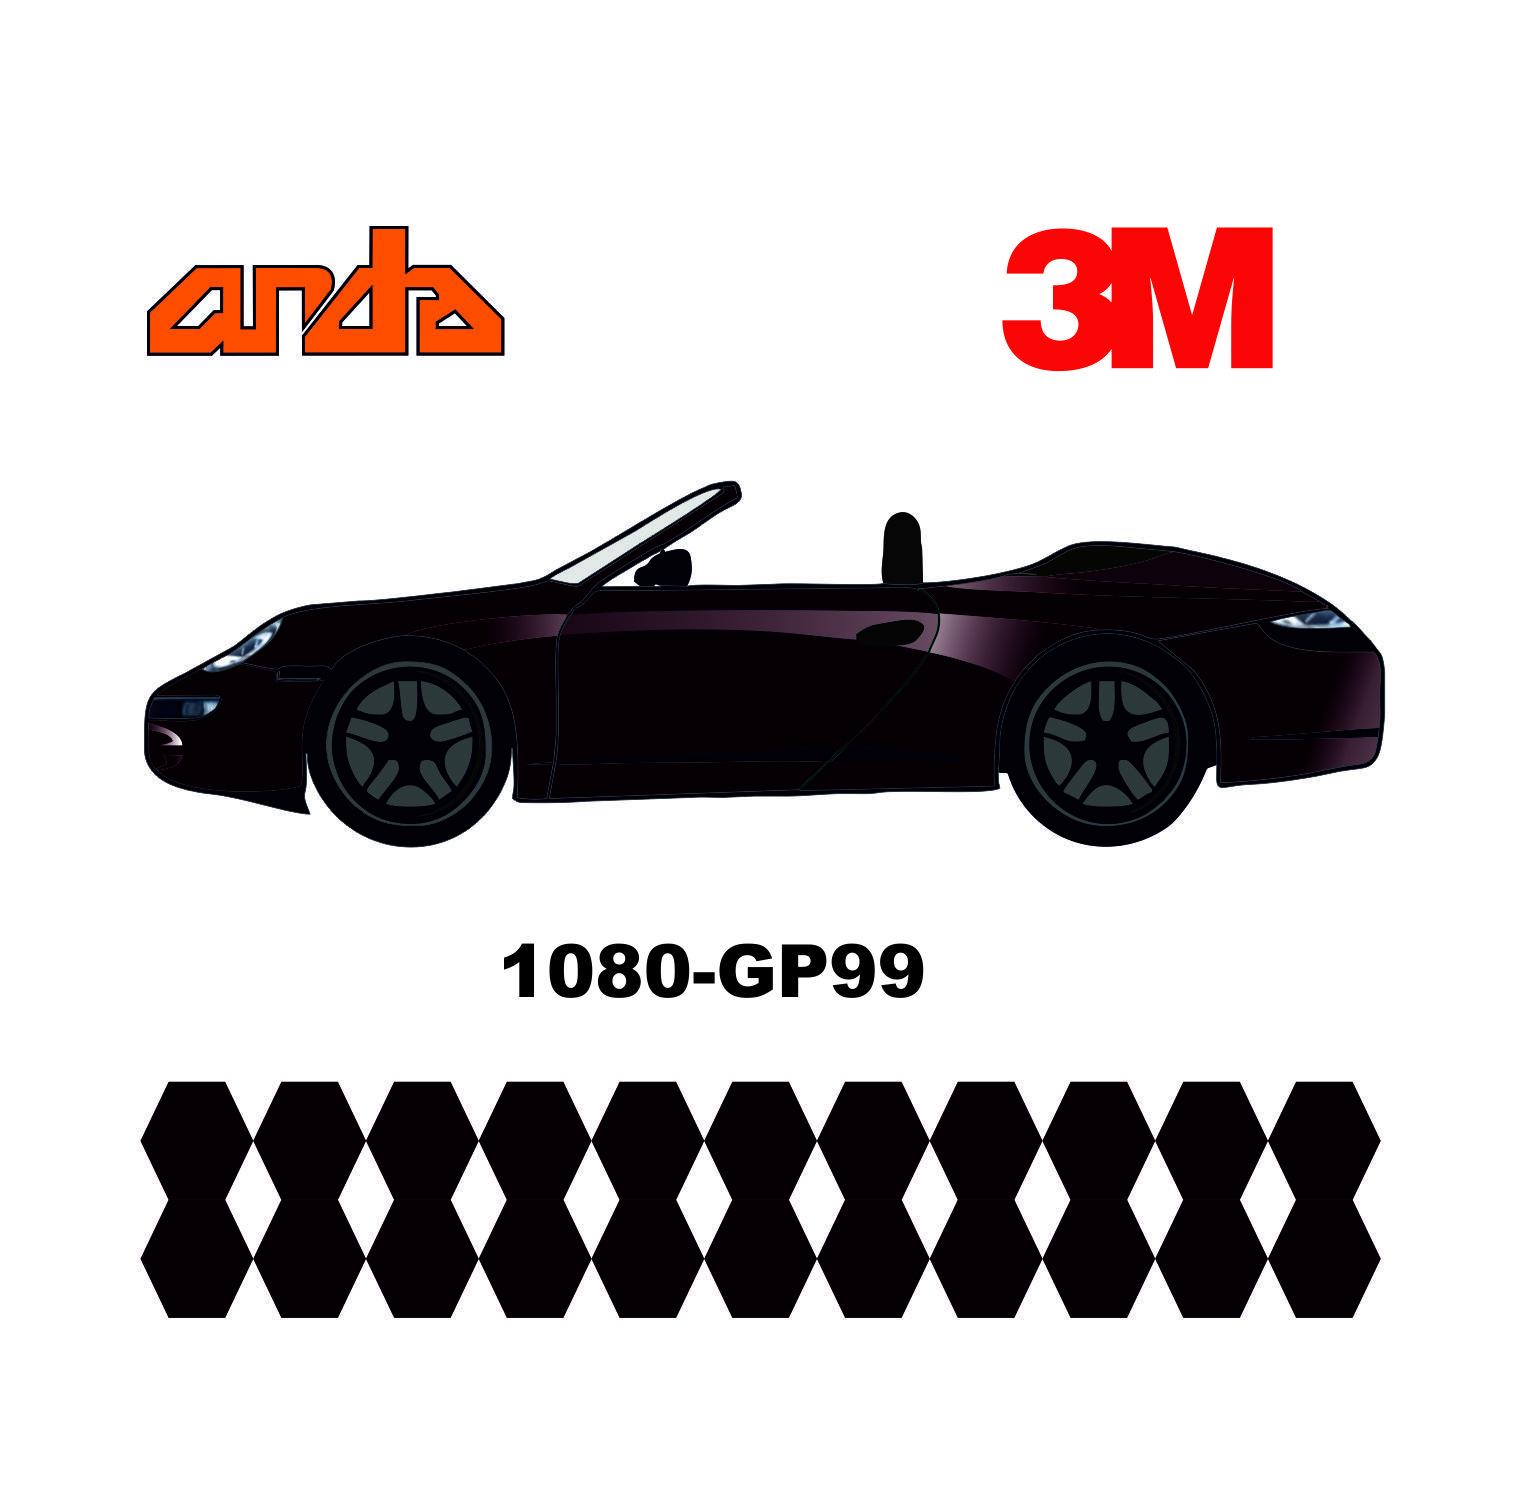 3M 1080-GP99 Parlak Karagül 1